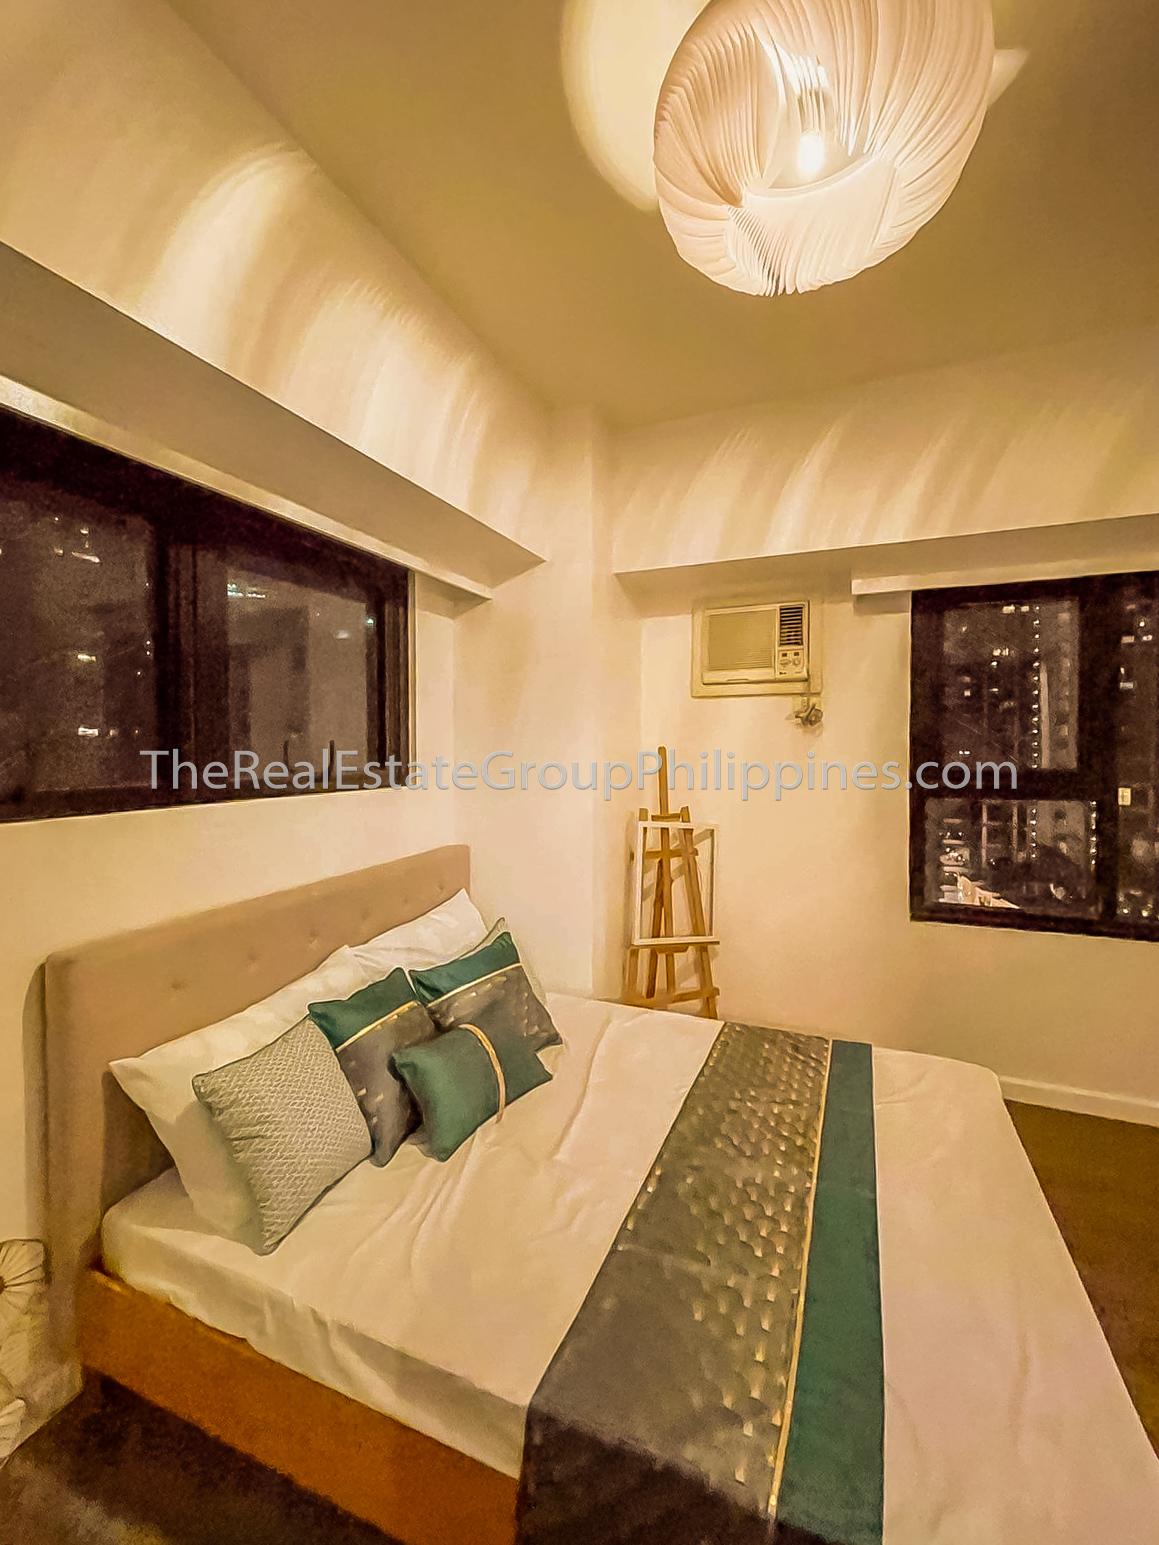 3 Bedroom Condominium For Sale BGC, Three Bedroom Condo For Sale Fort Residences, 3 BR Condo For Sale BGC Taguig, 3BR Condo For Sale Burgos Circle BGC5